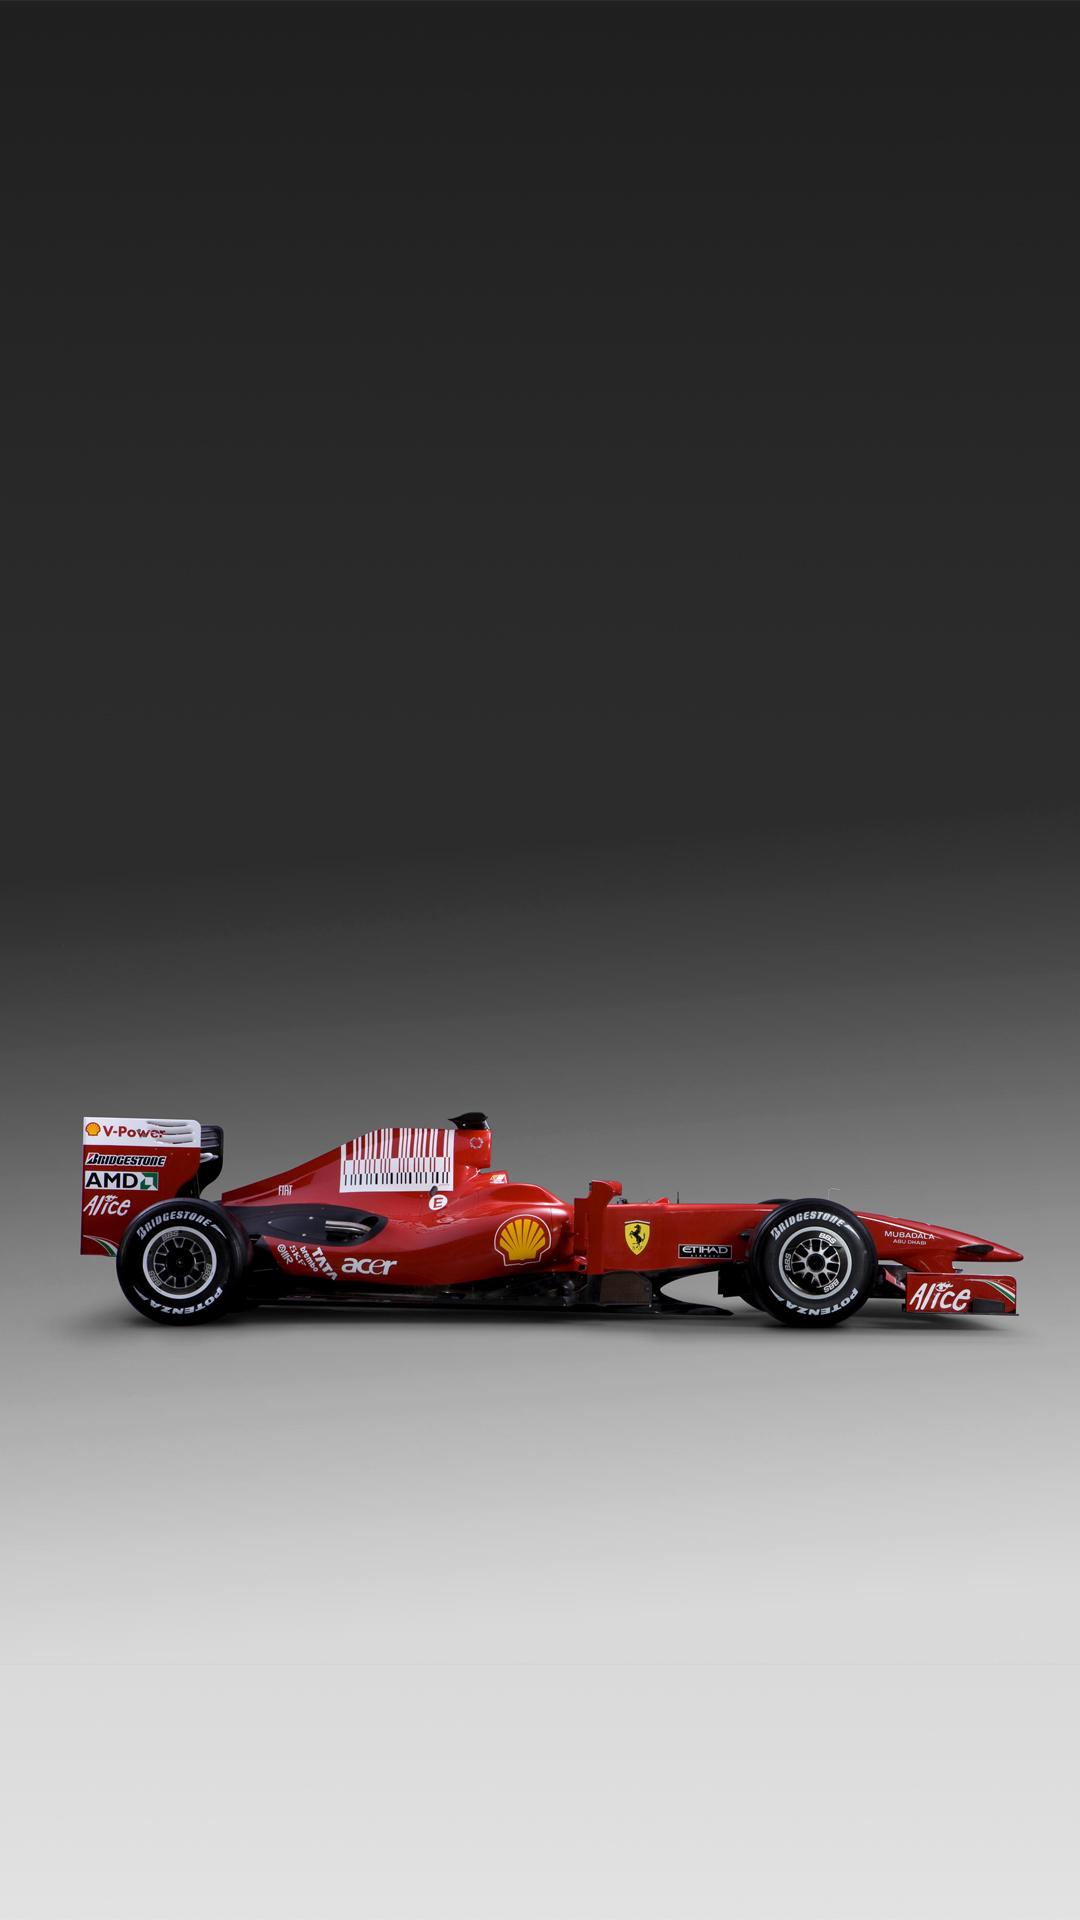 Ferrari F60 F1 car HTC one wallpaper